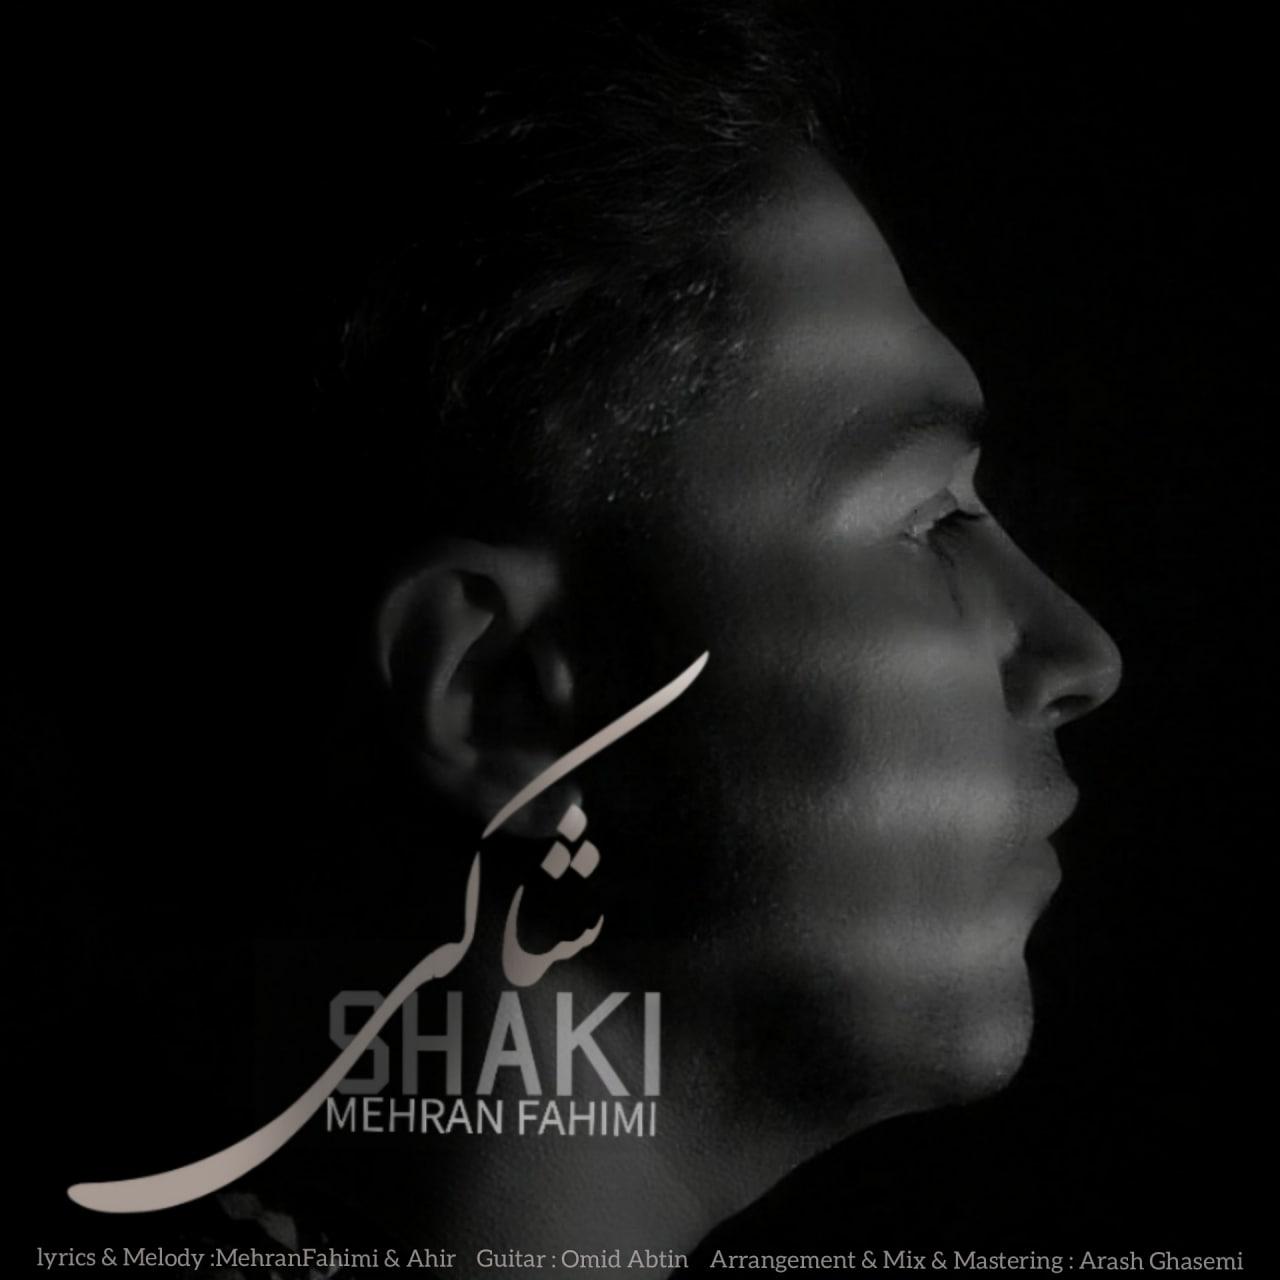 Mehran Fahimi – Shaki